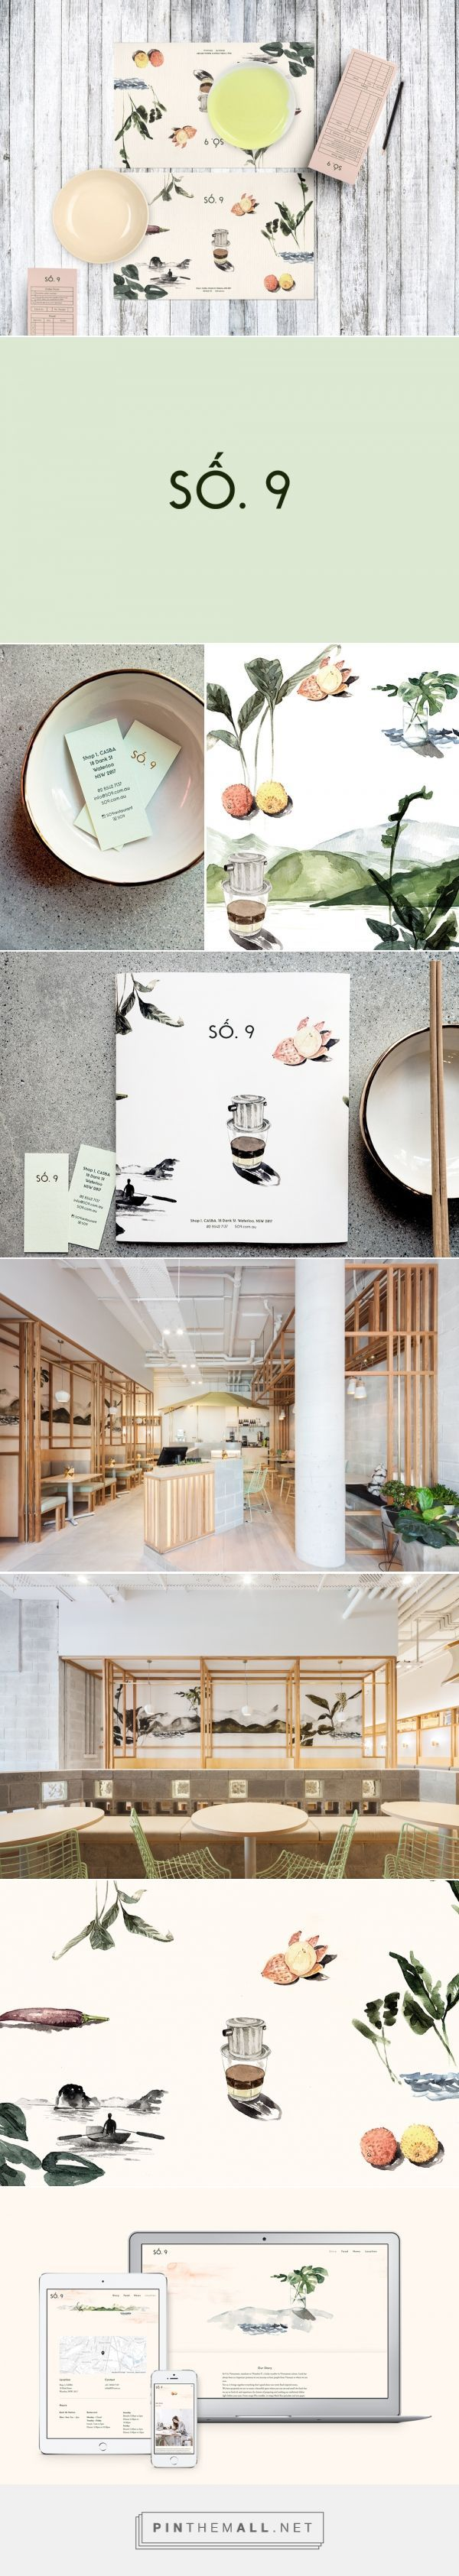 SO.9's Vietnamese Restaurant Branding by BrandWorks Studio | Fivestar Branding Agency – Design and Branding Agency & Curated Inspiration Gallery